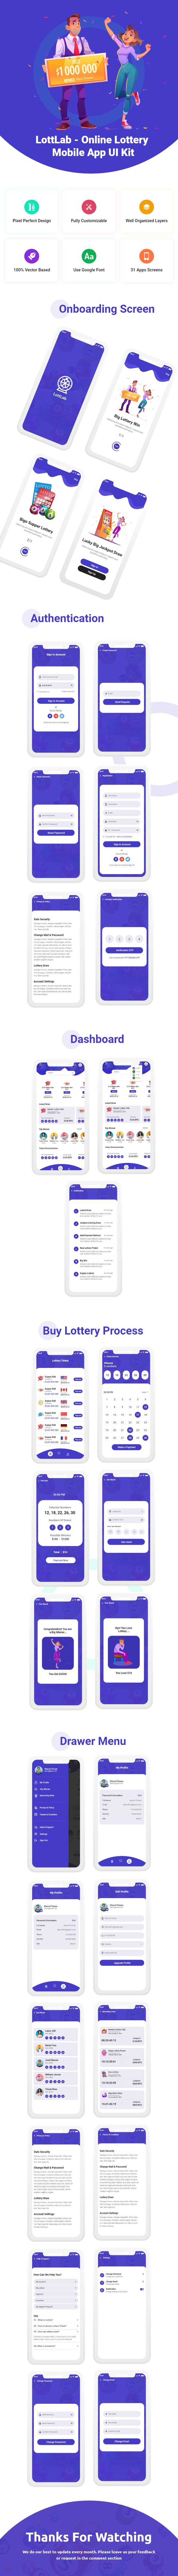 LottLab - Online Lottery Mobile App UI Kit - 1